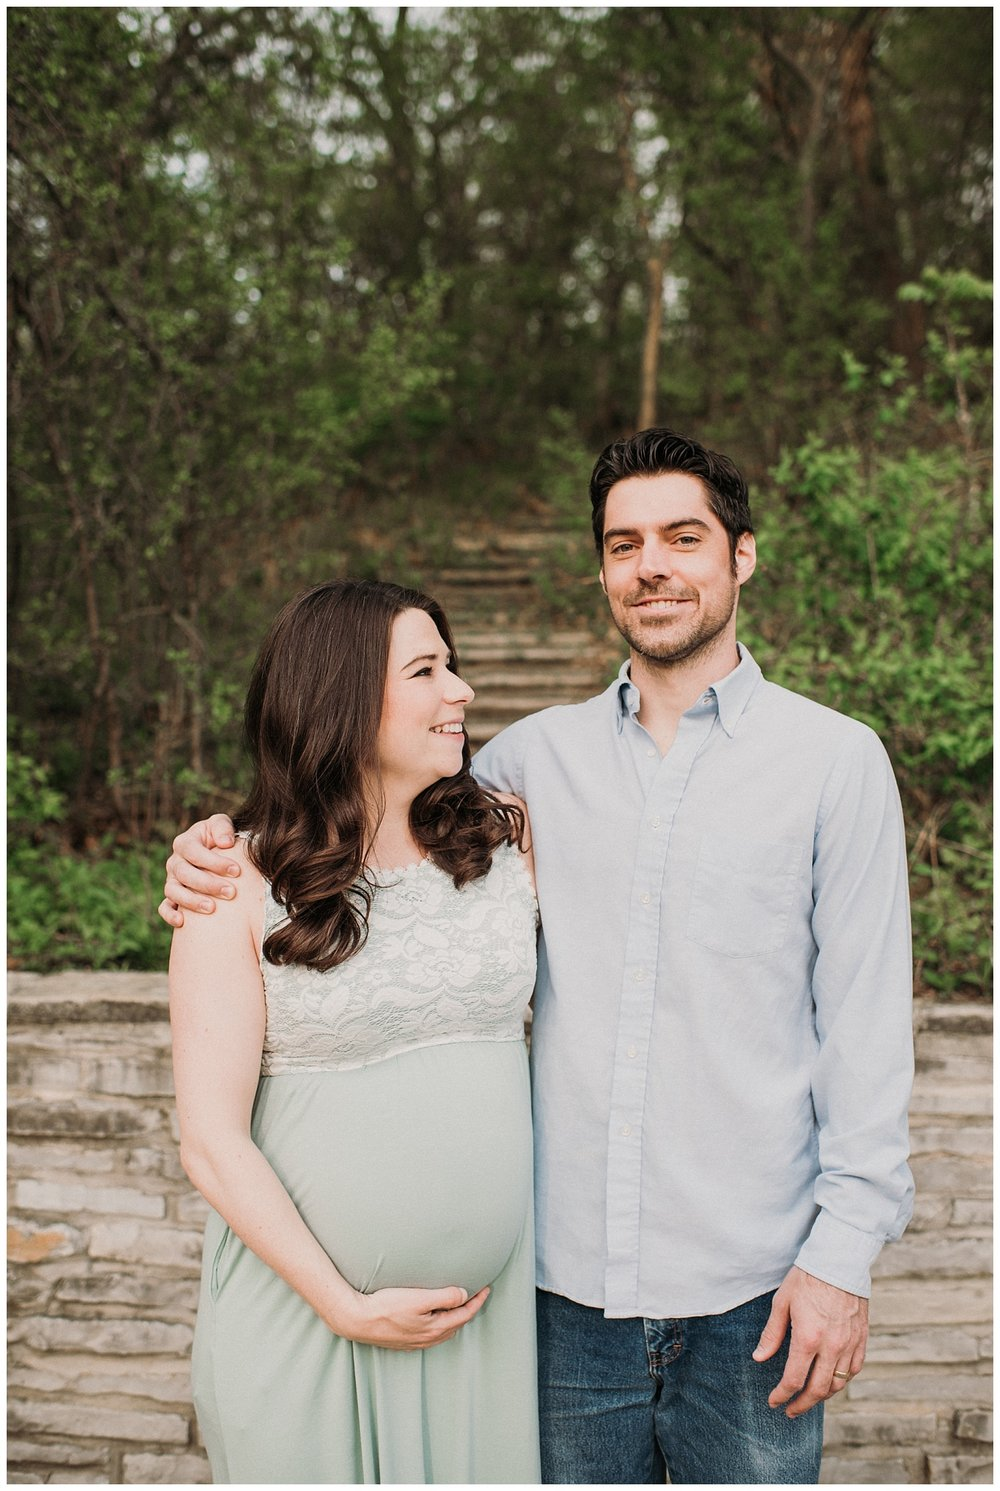 Milwaukee-Maternity-Photographer-2019 (11).jpg